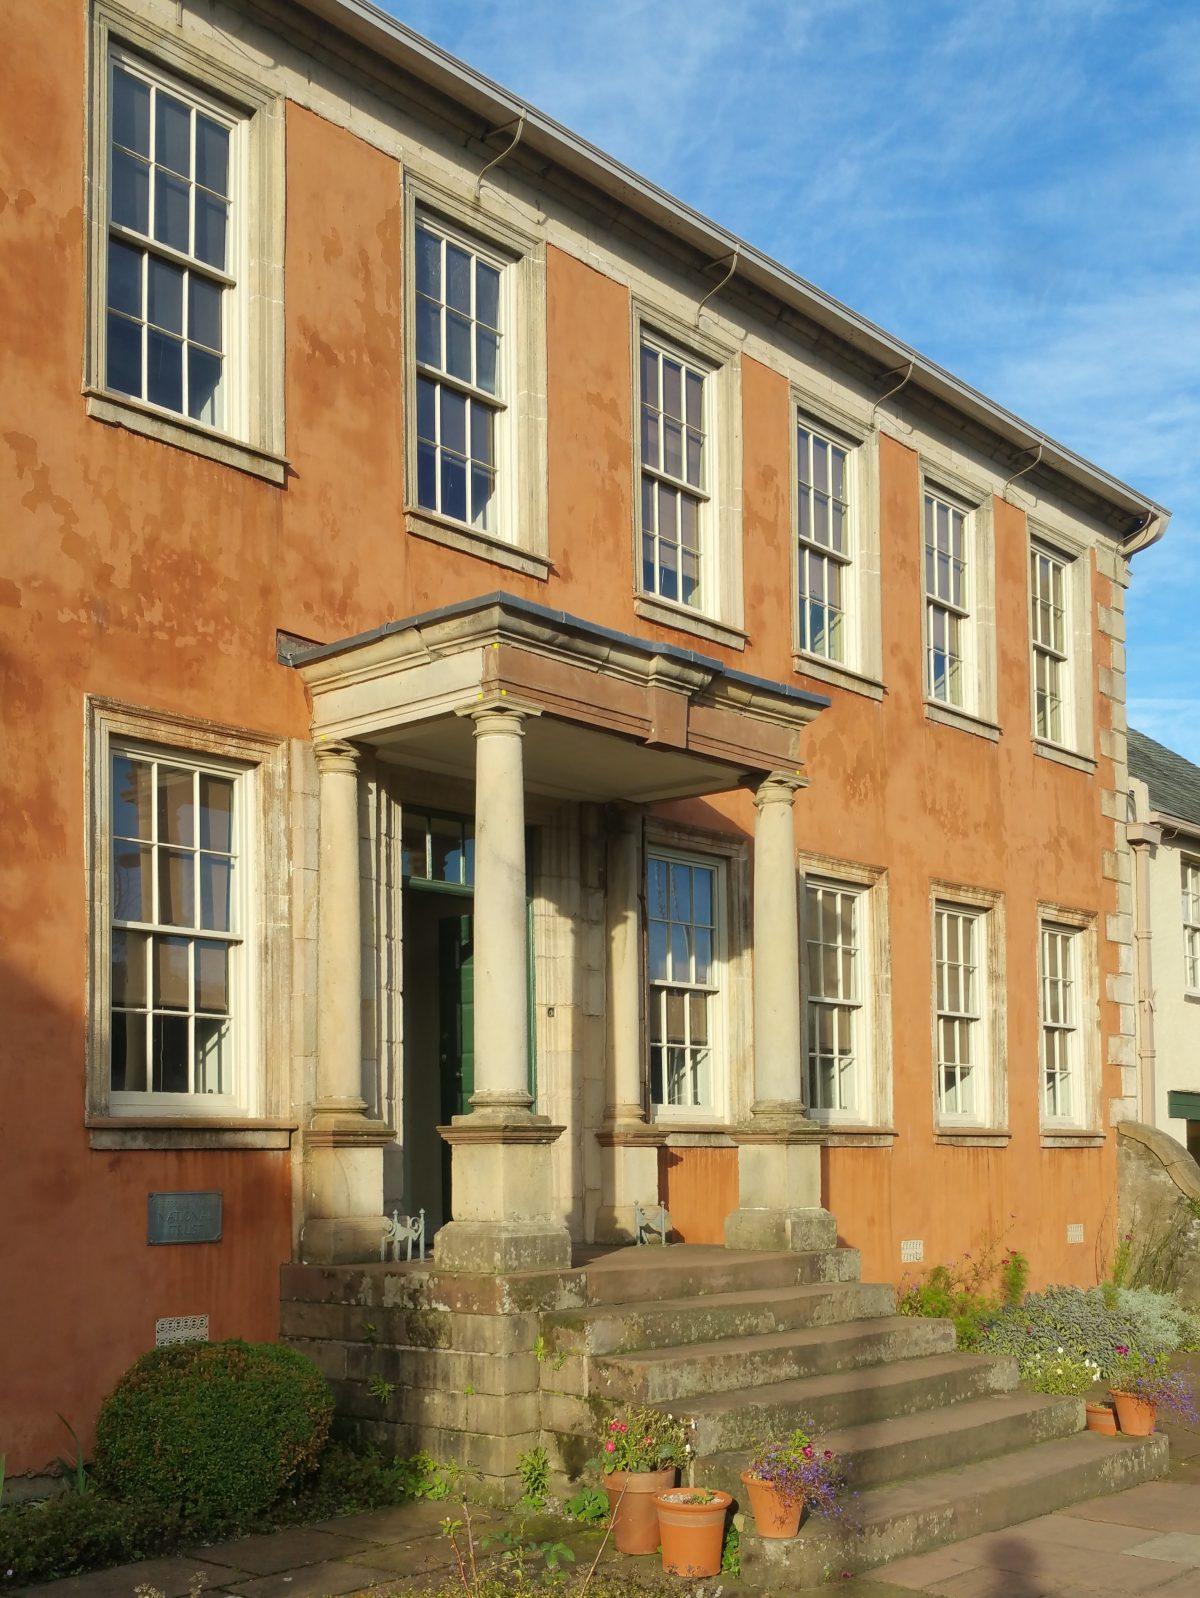 Wordsworth House, Cockermouth, Cumbria